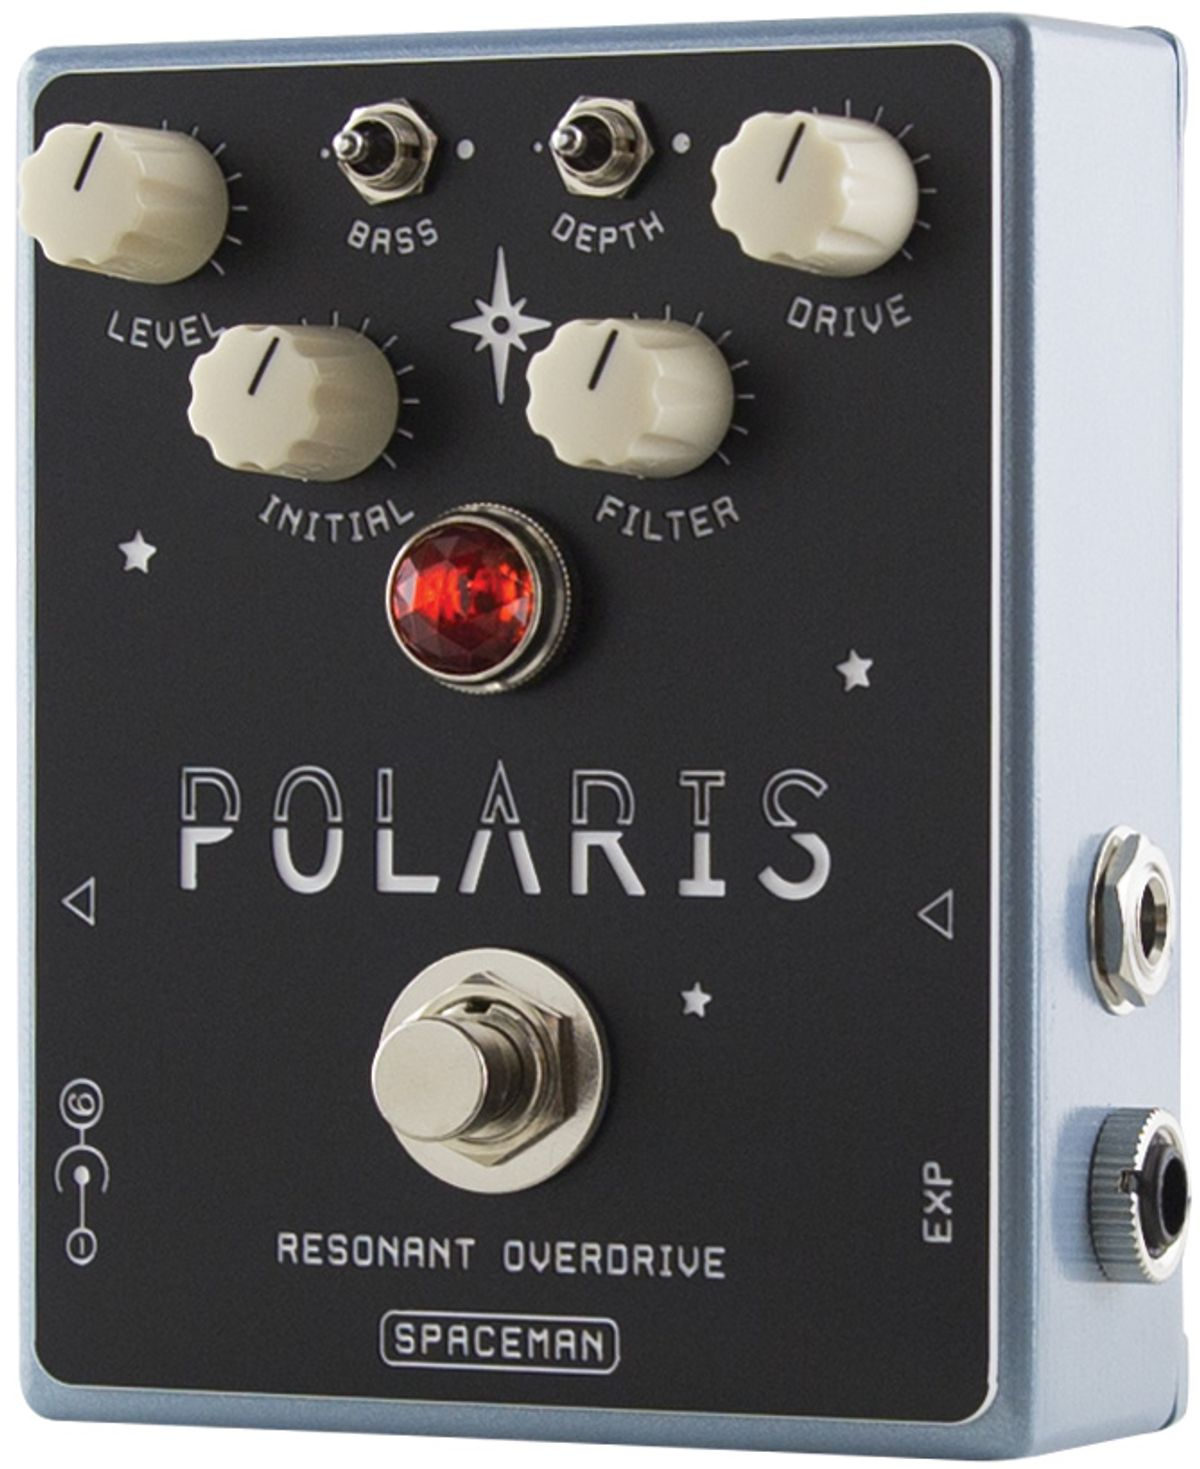 Quick Hit: Spaceman Polaris Review